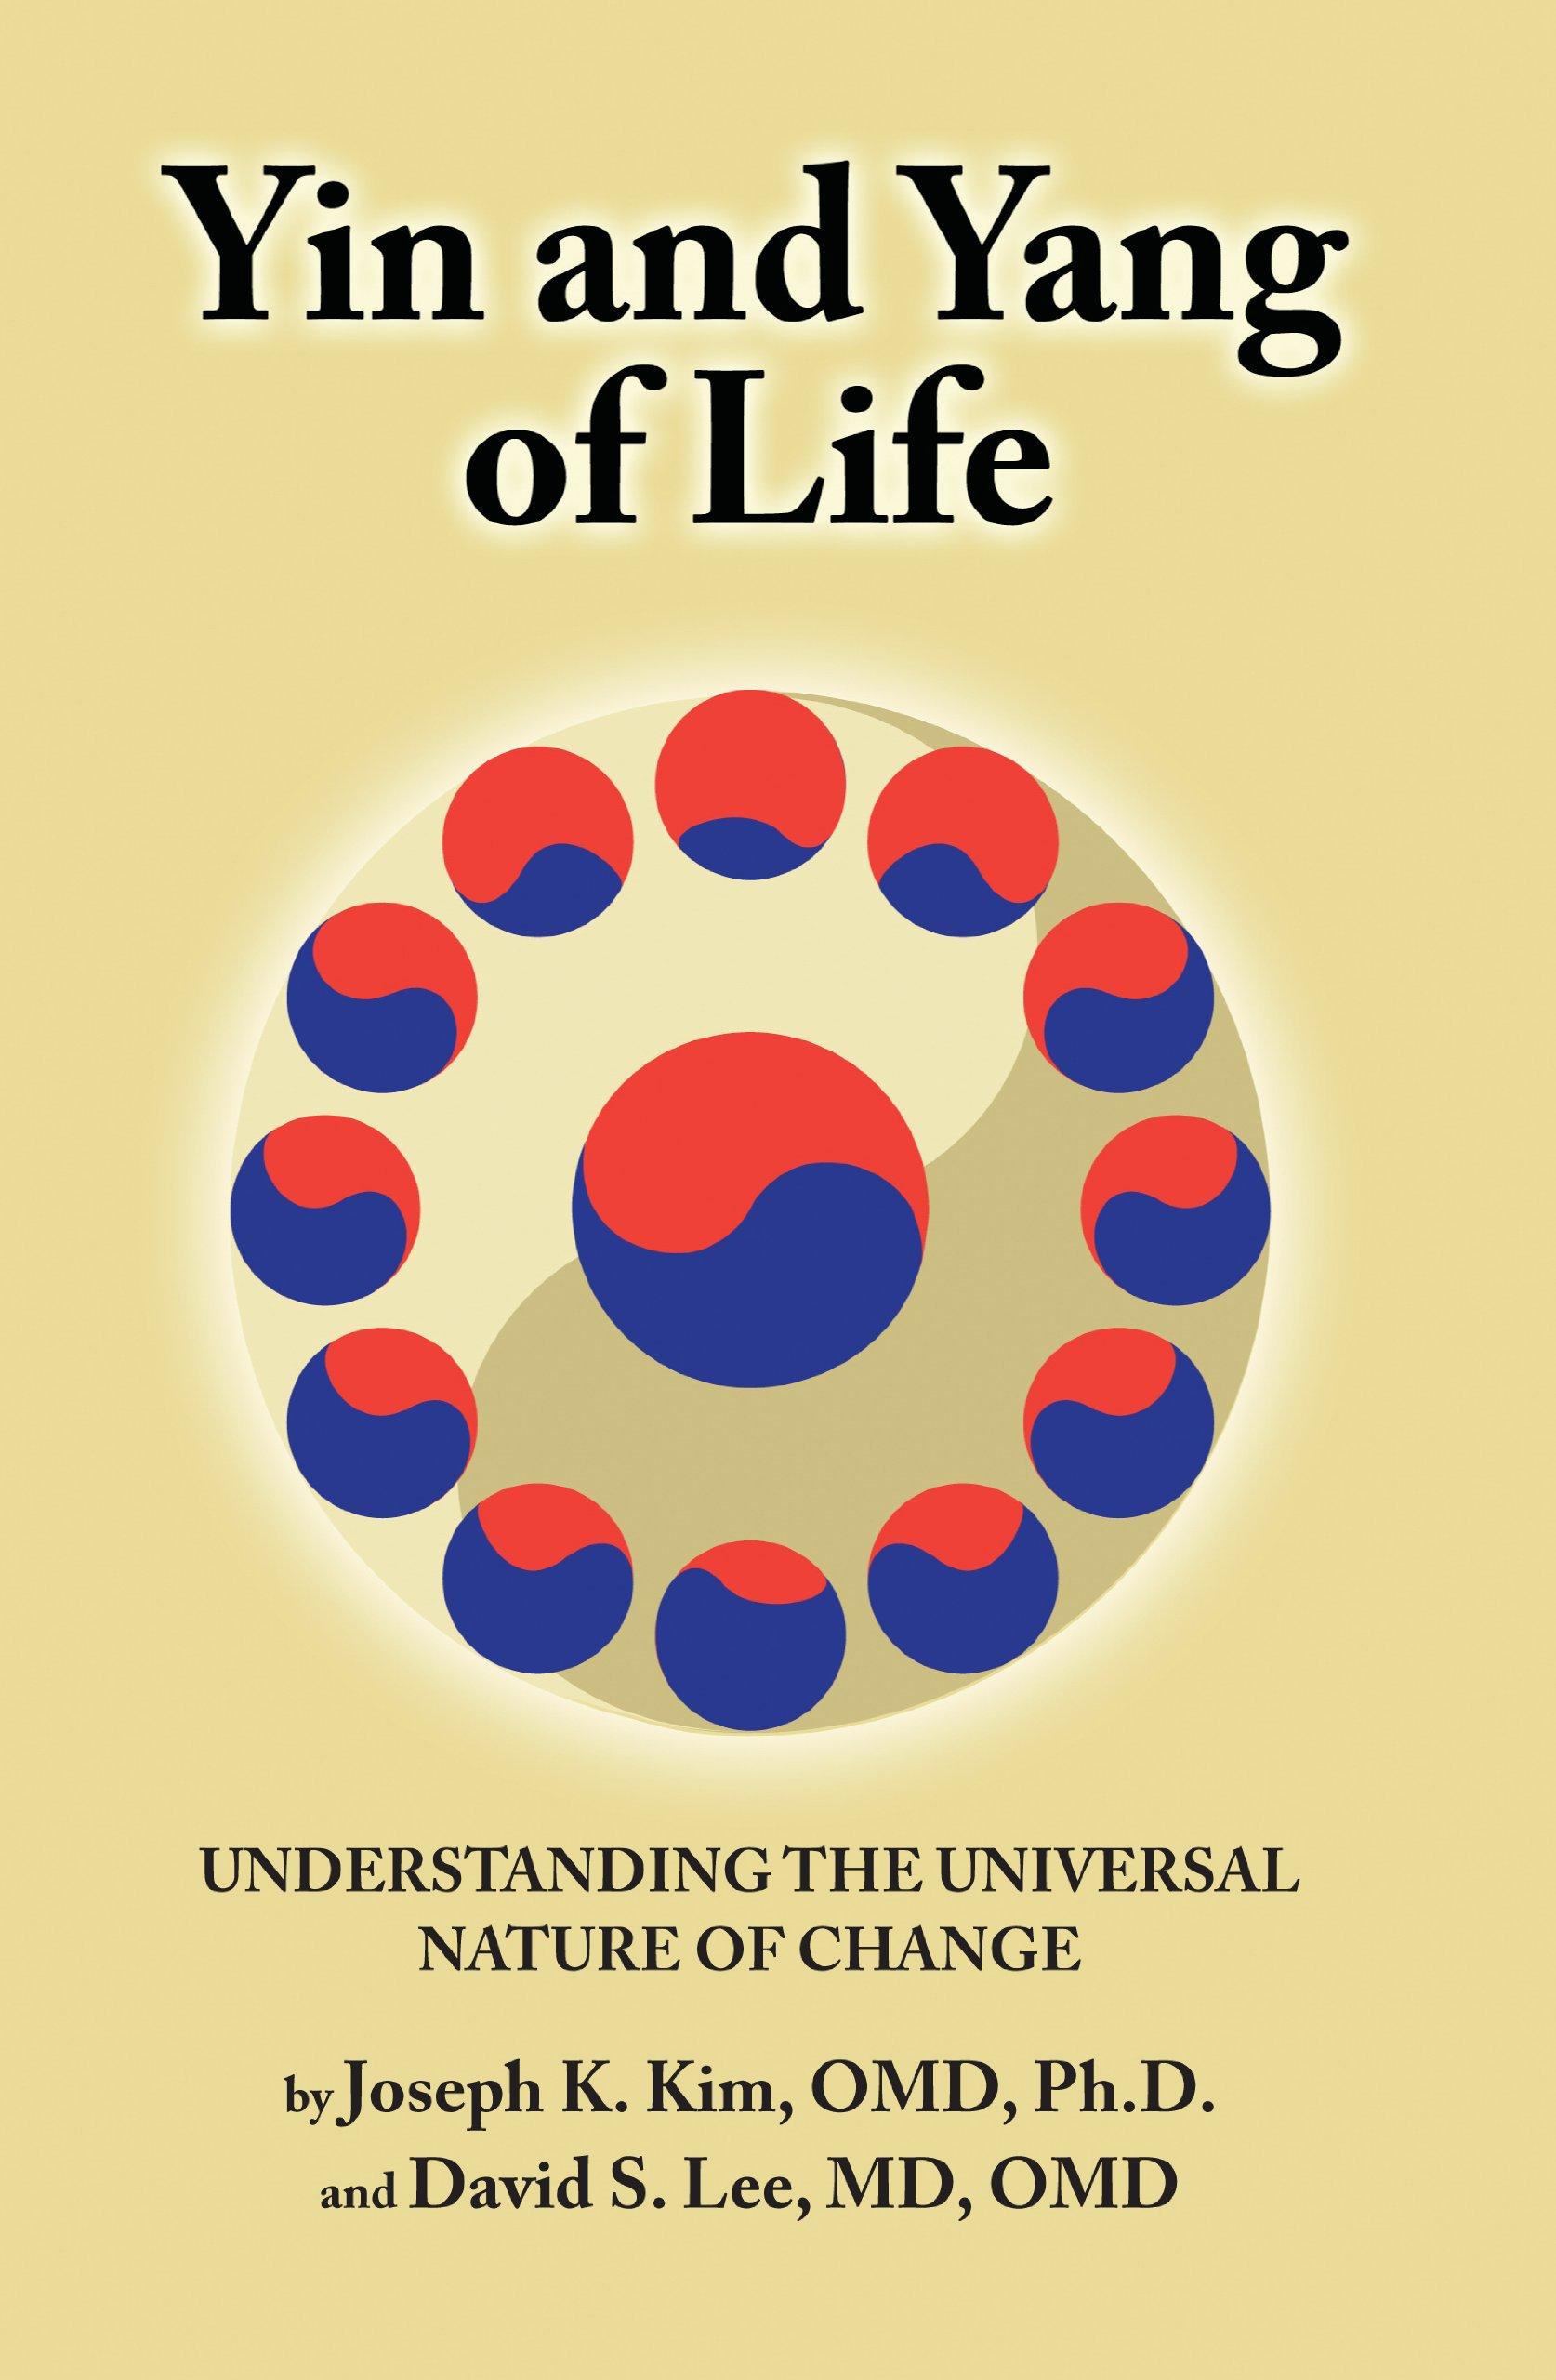 Yin and Yang of Life, Joseph K. Kim; David S. Lee